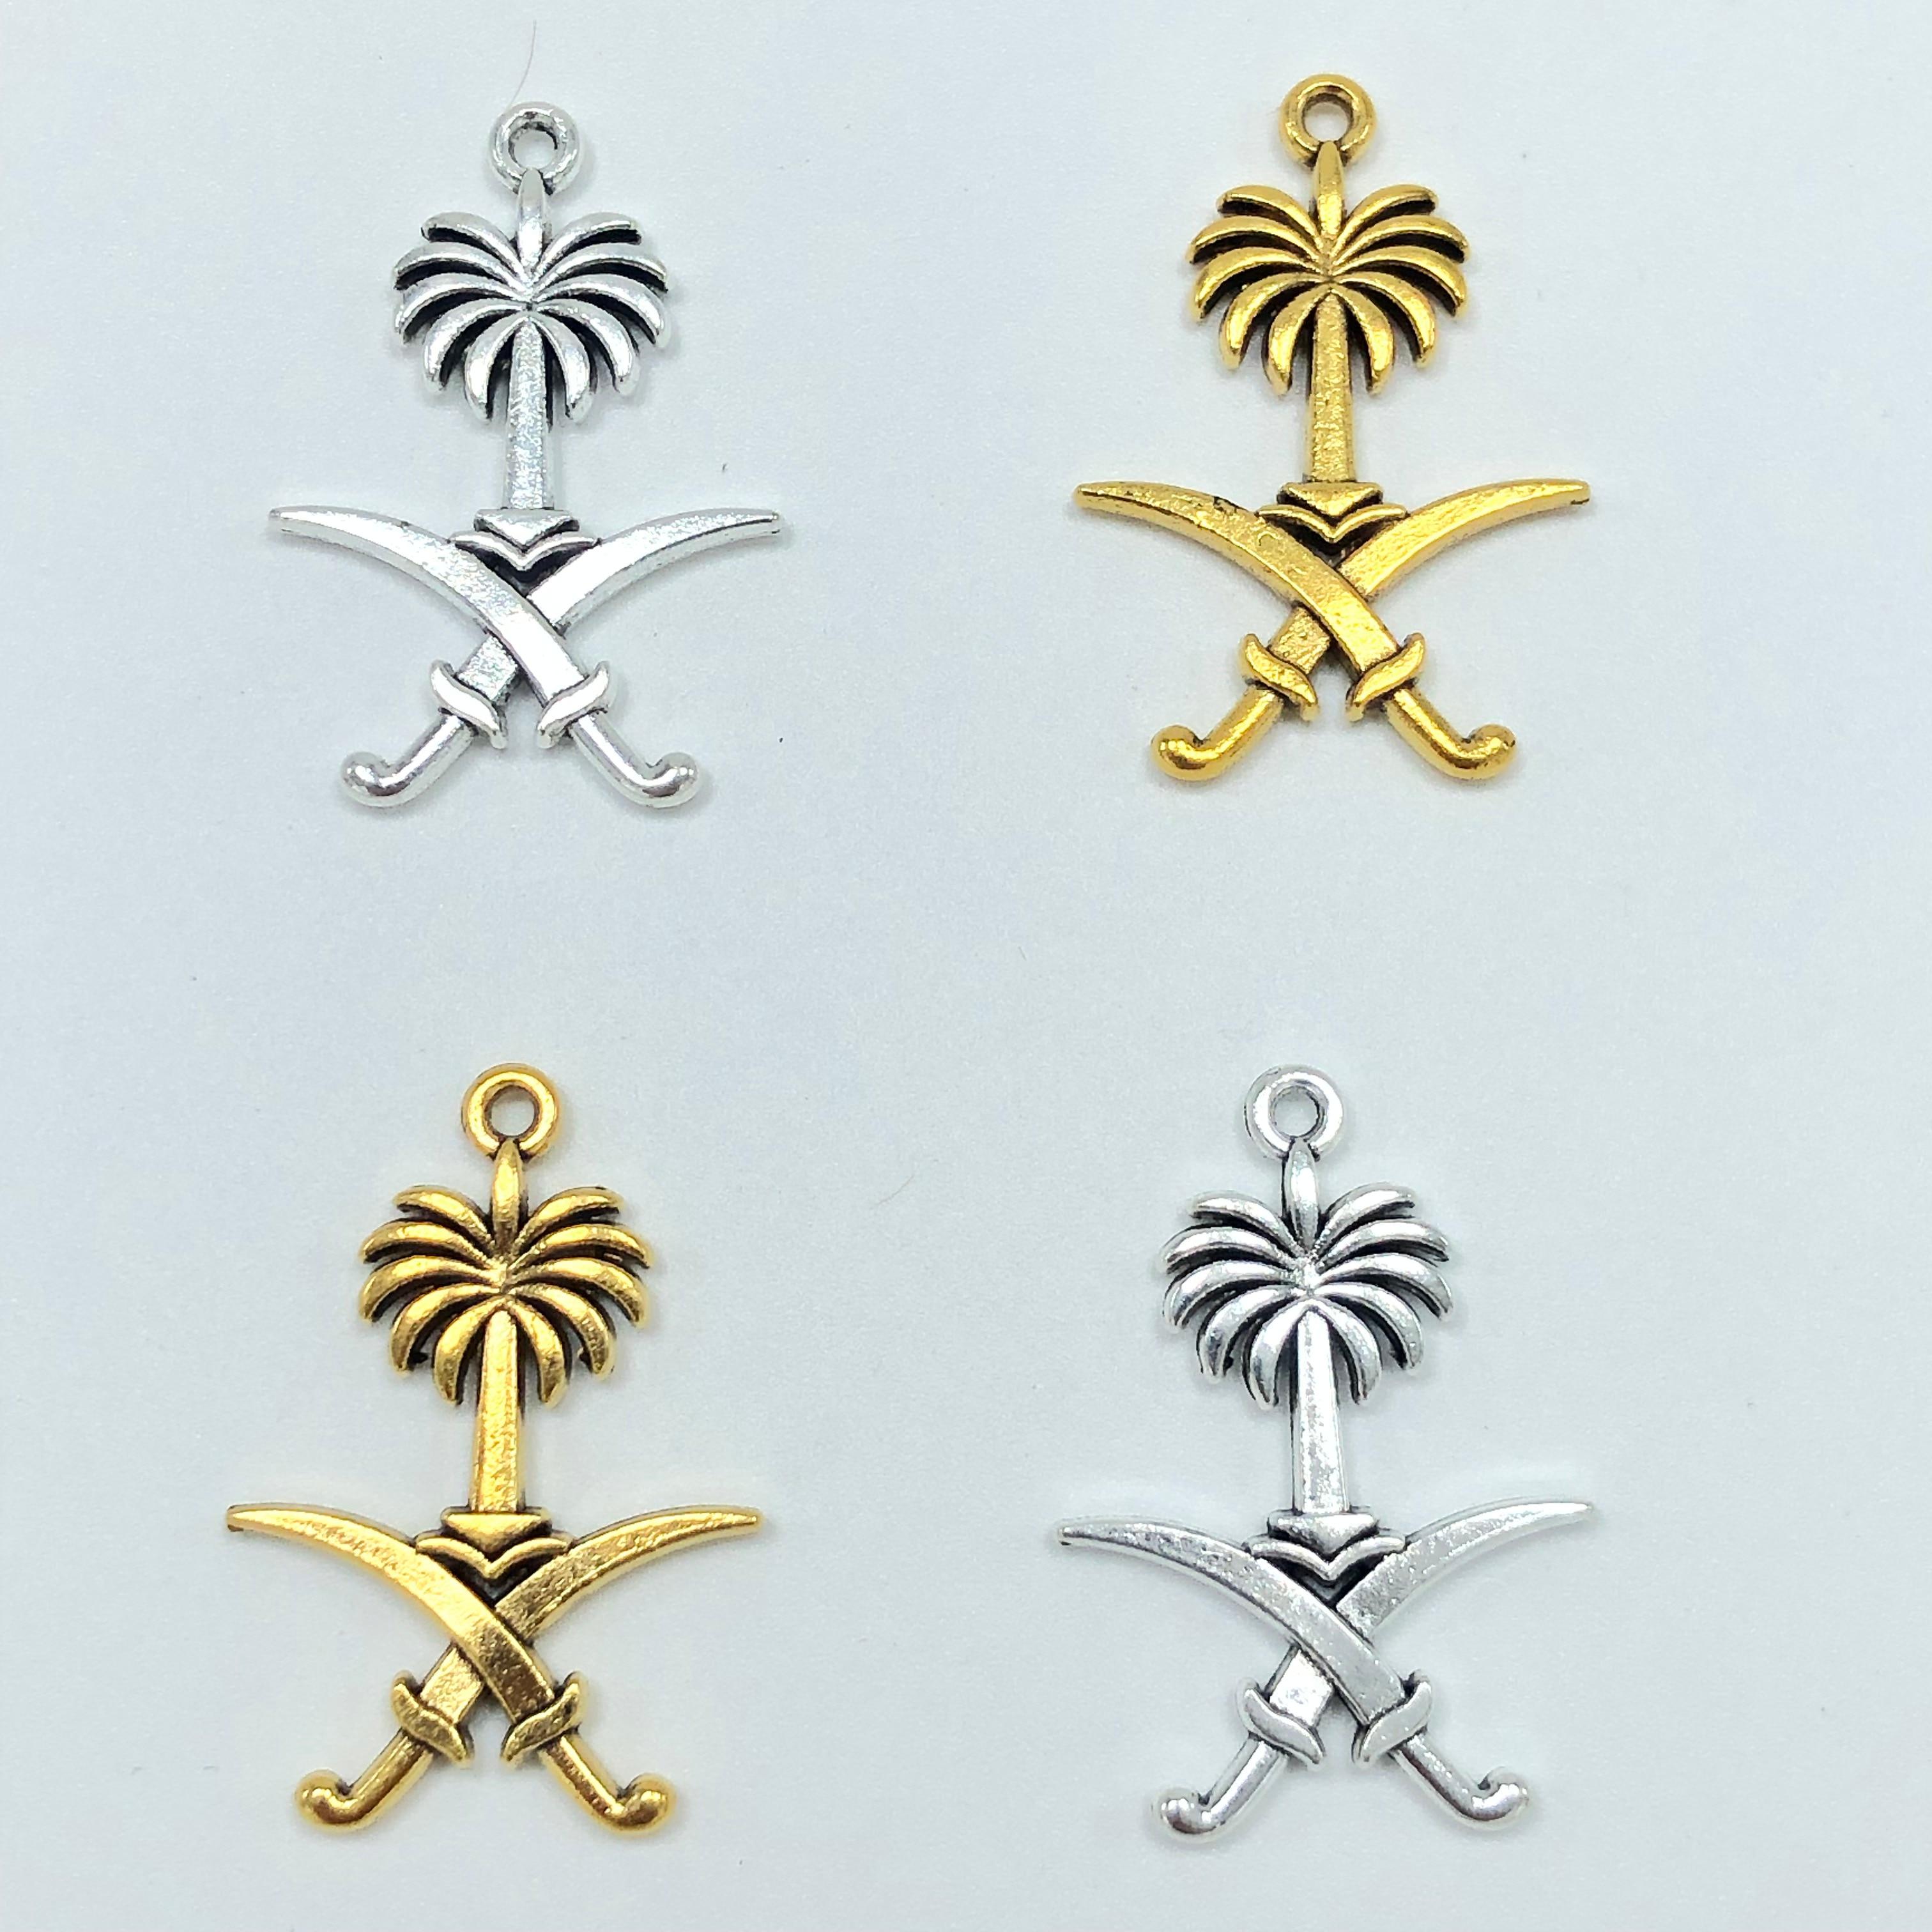 10pcs 22mm*31mm Popular Saudi Arabia National Emblem Pendant Muslim Tassel DIY Handmade Bracelet Necklace Jewelry Findings